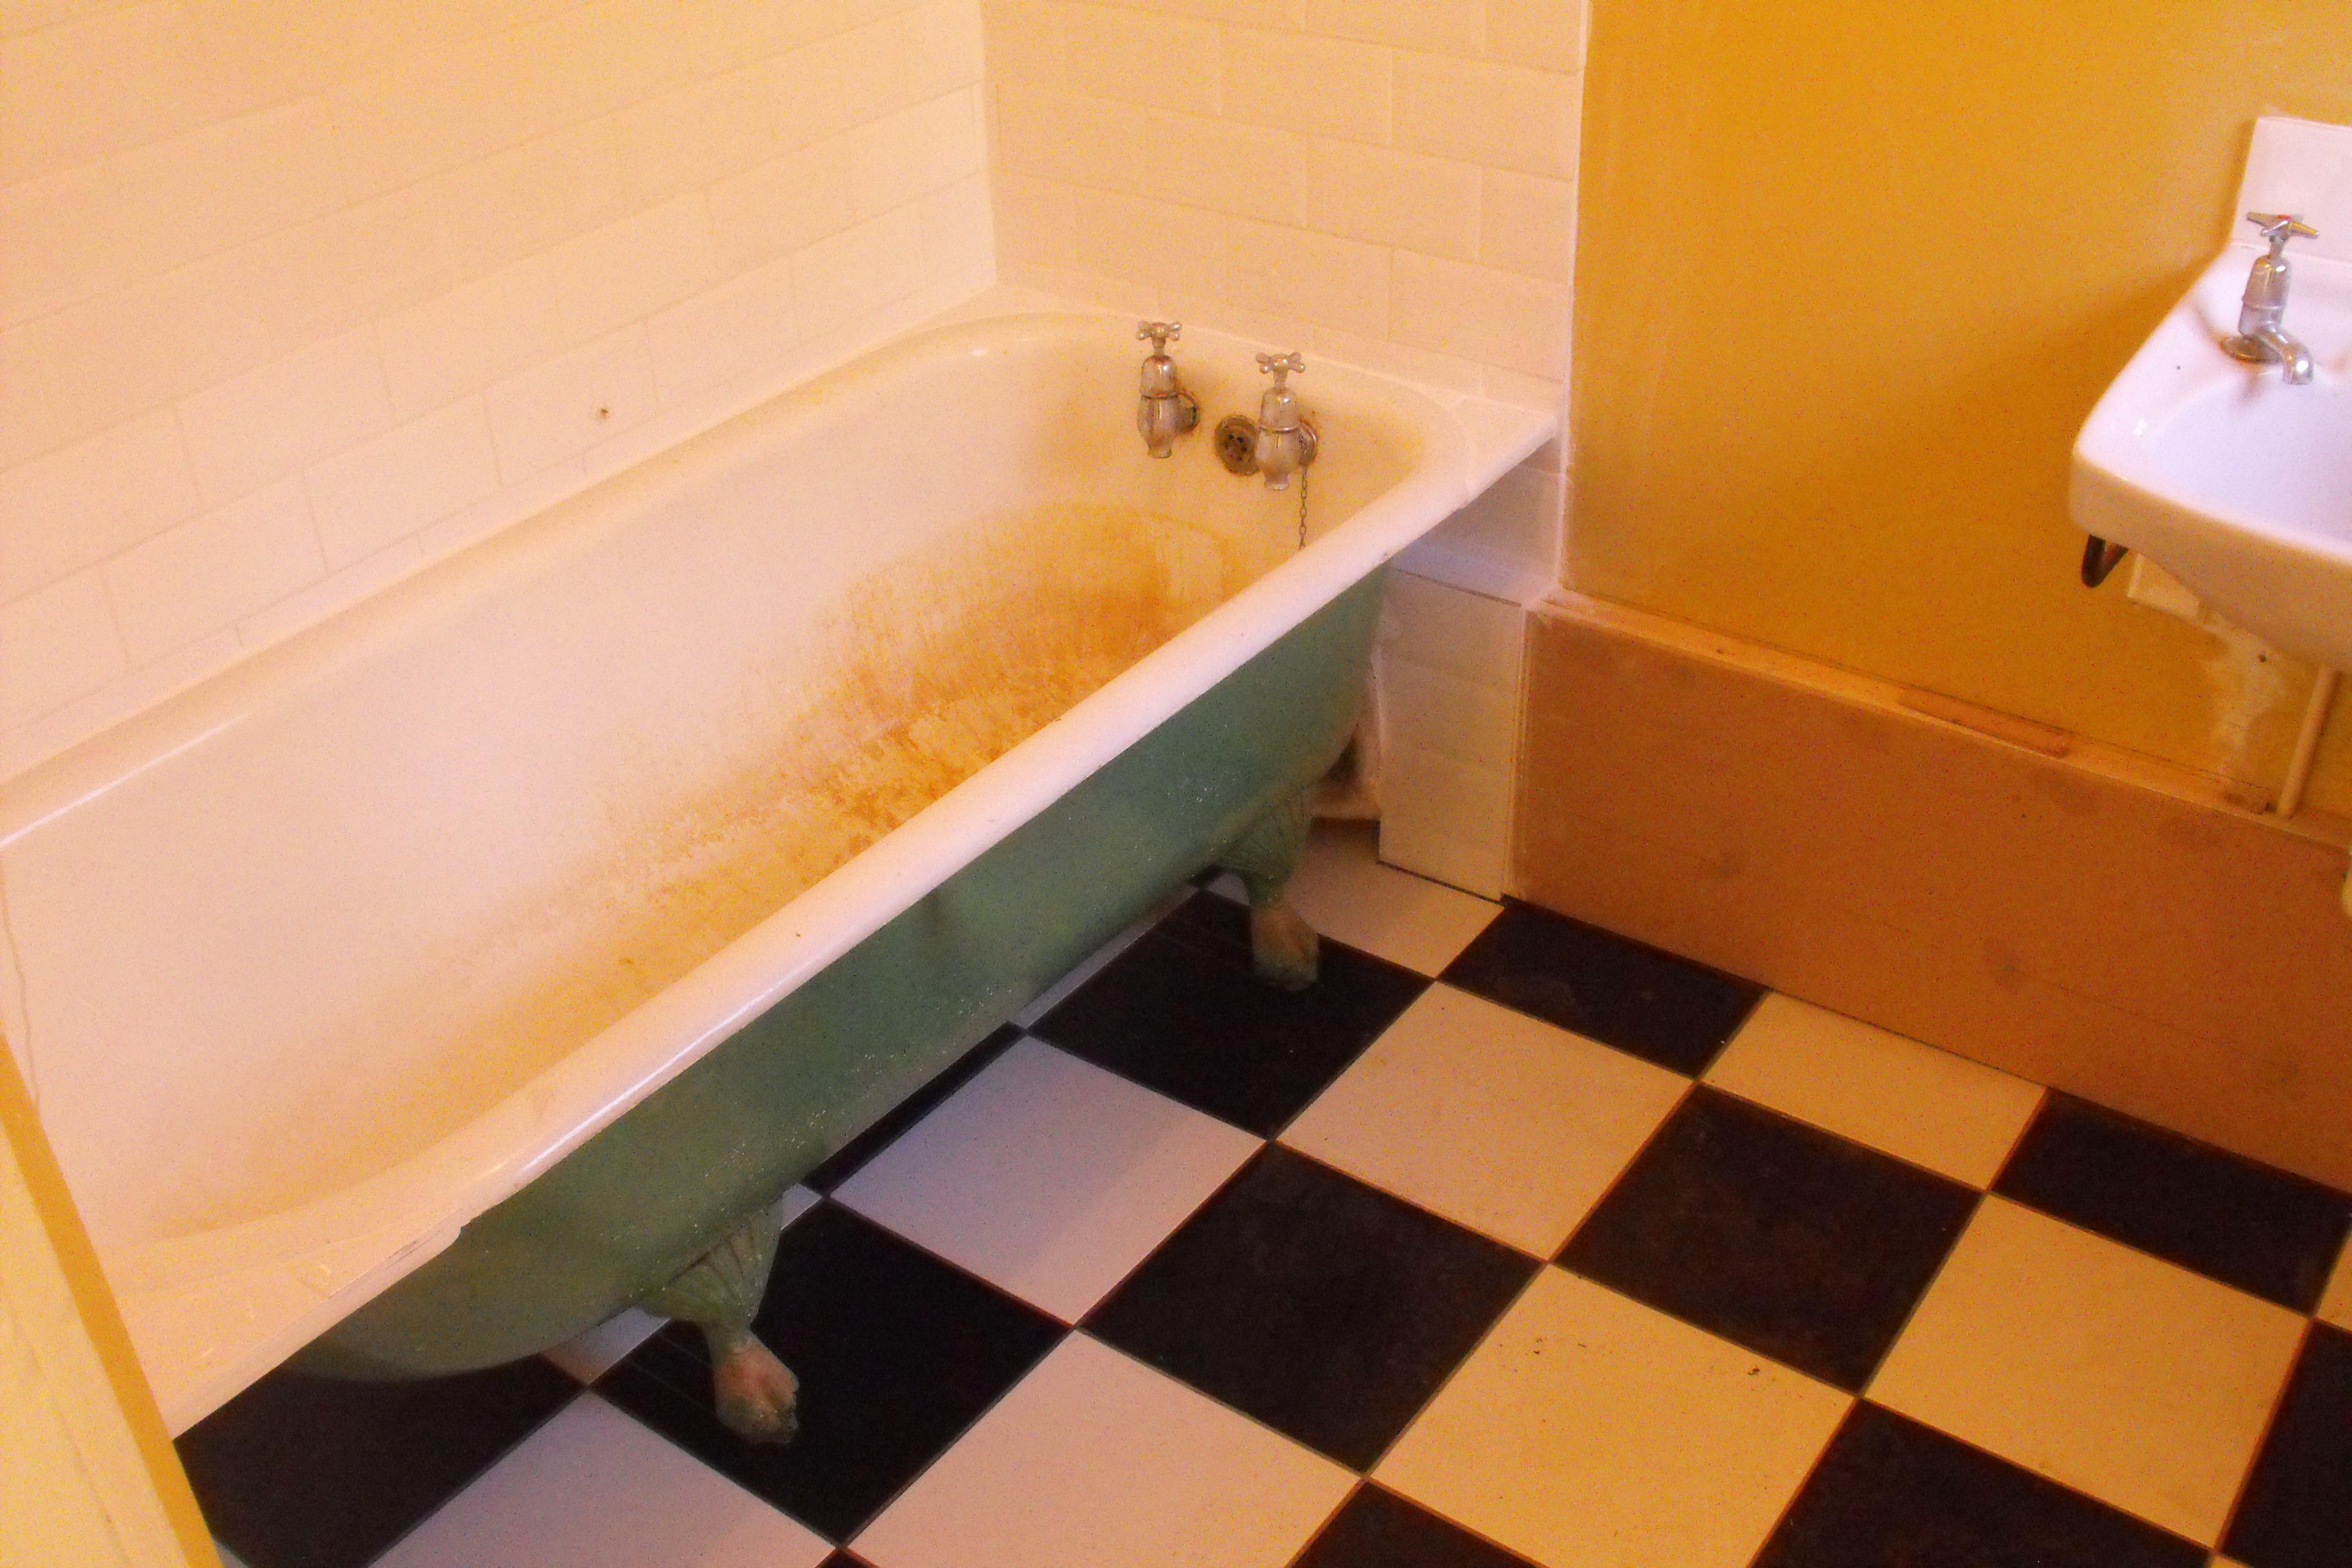 CAST IRON ROLL TOP BATH RESTORED - The Bath BusinessThe Bath Business